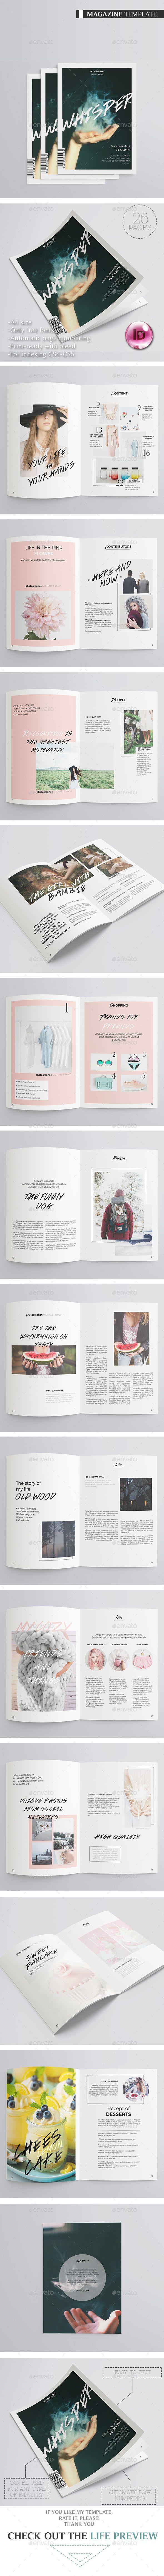 Multipurpose Magazine Whisper | Diseño editorial, Editorial y Revistas